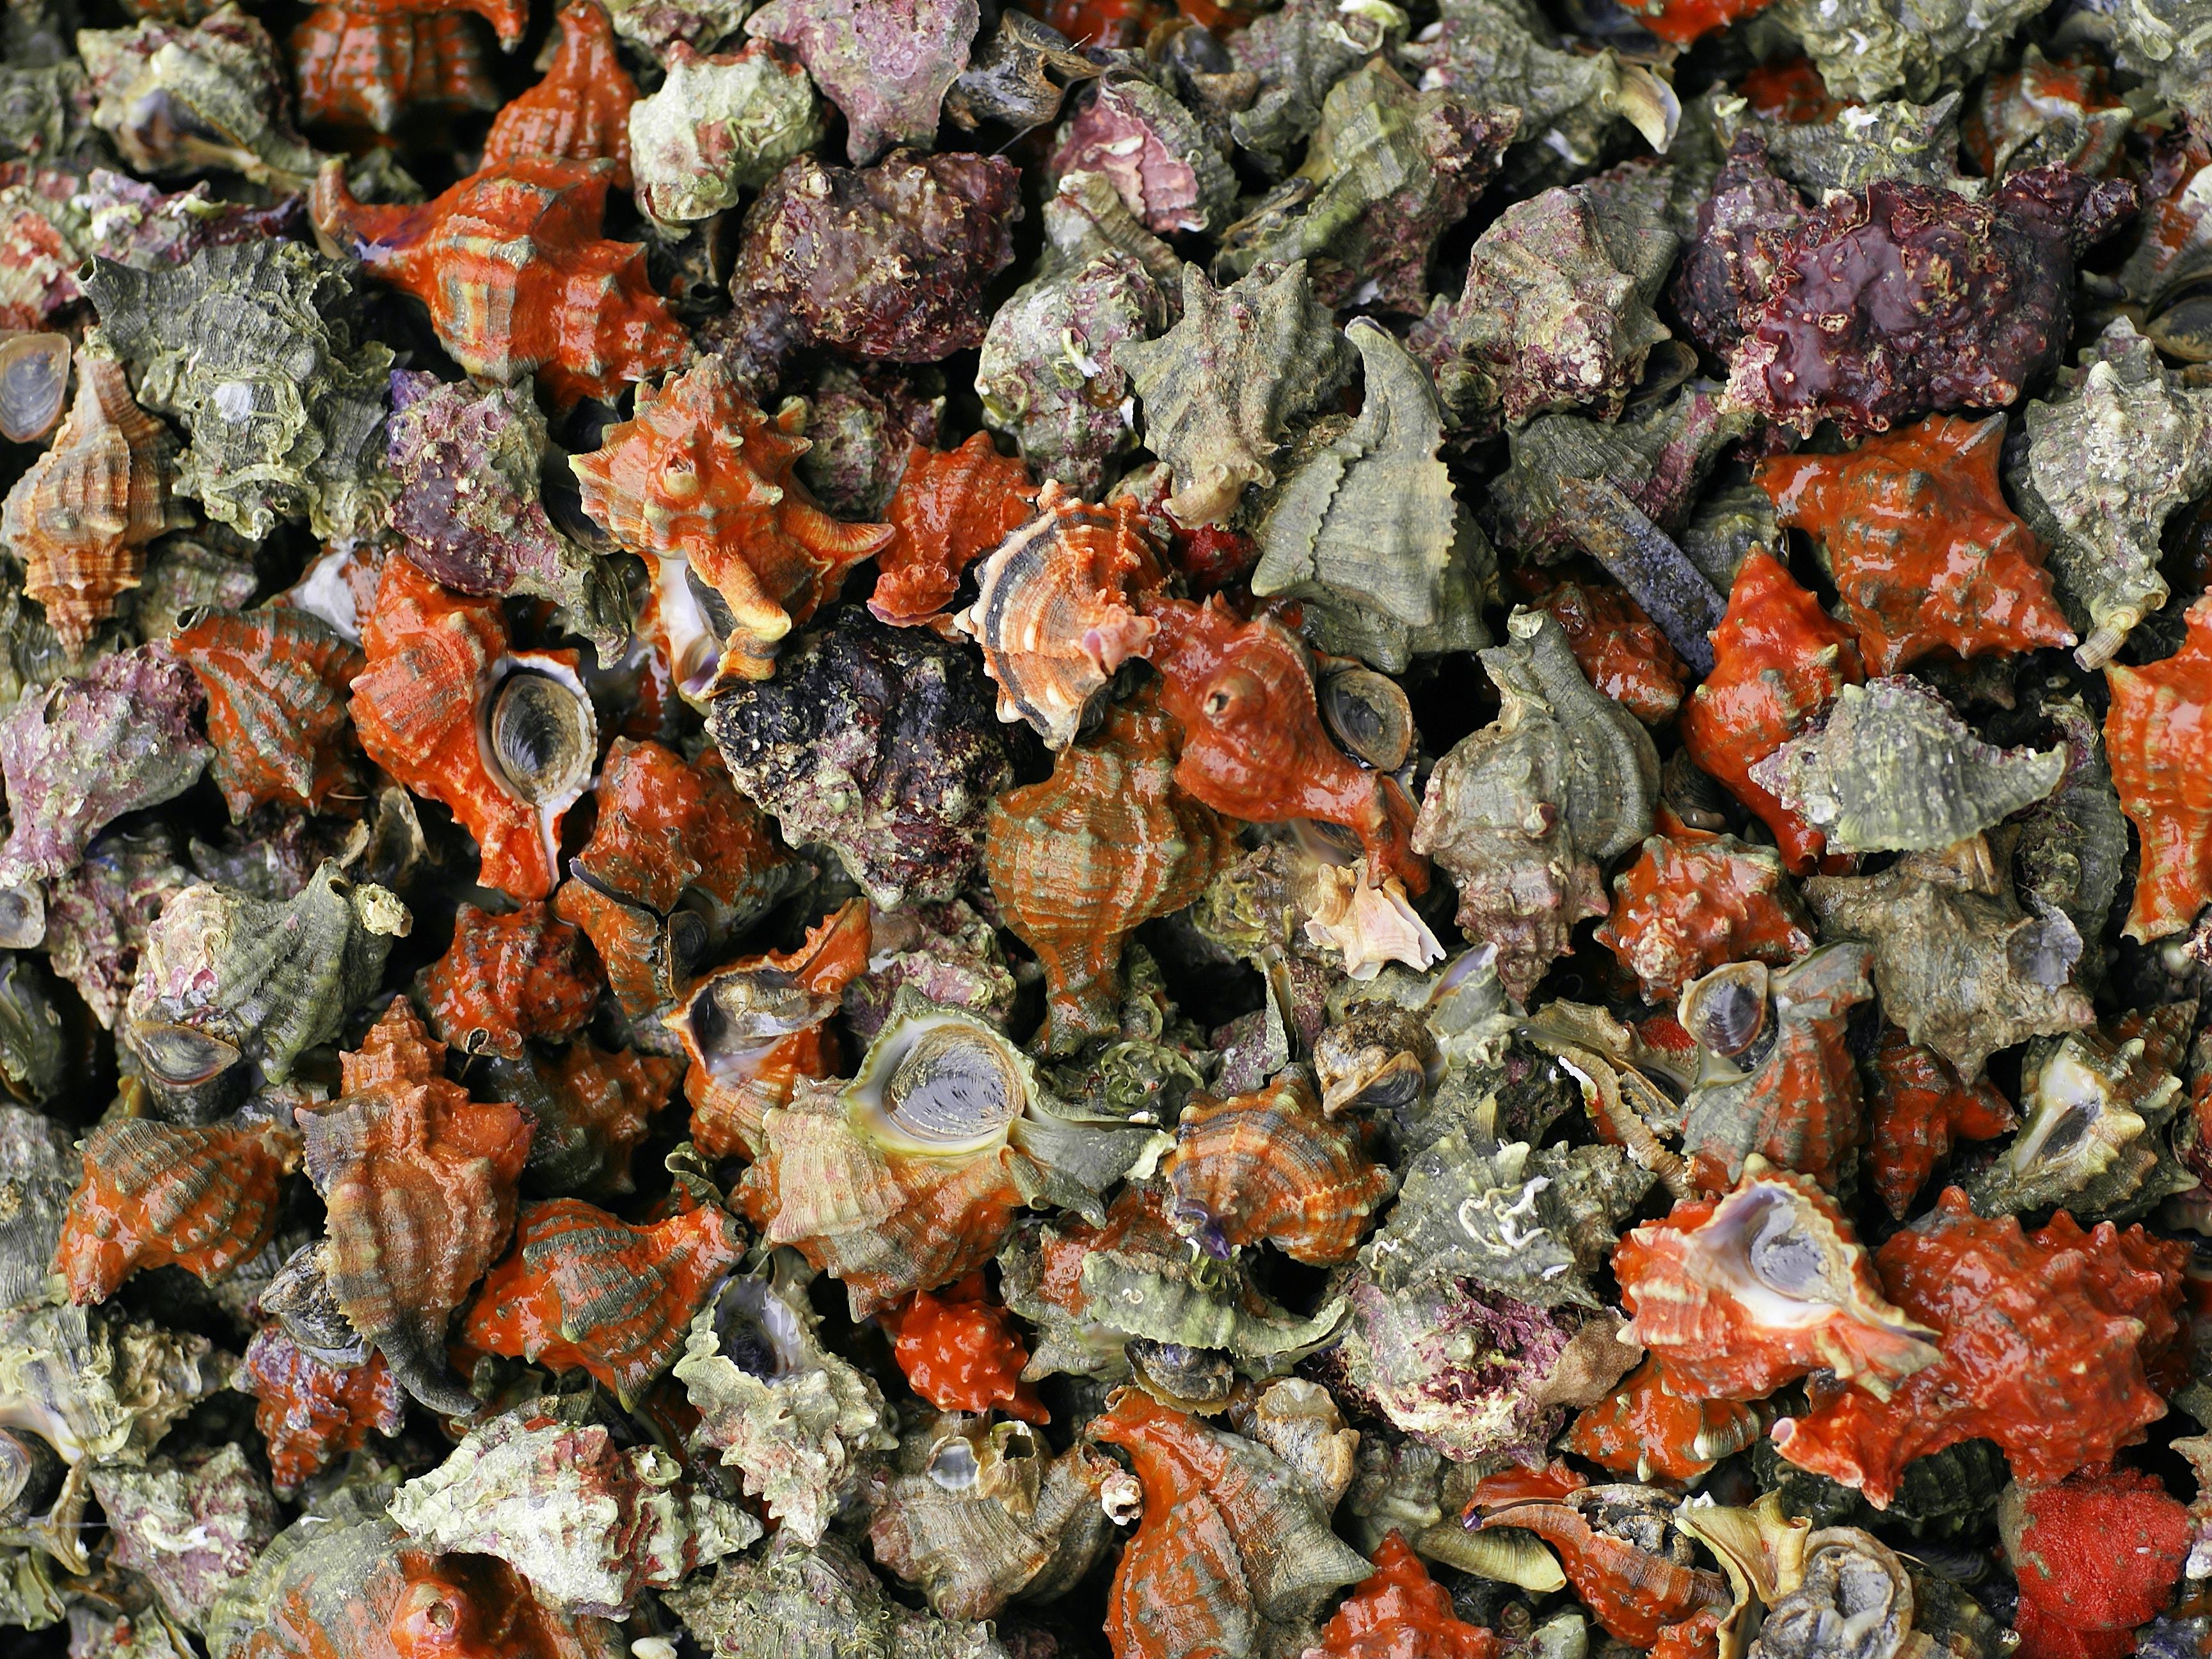 Fichier:Hexaplex trunculus.jpg — Wikipédia